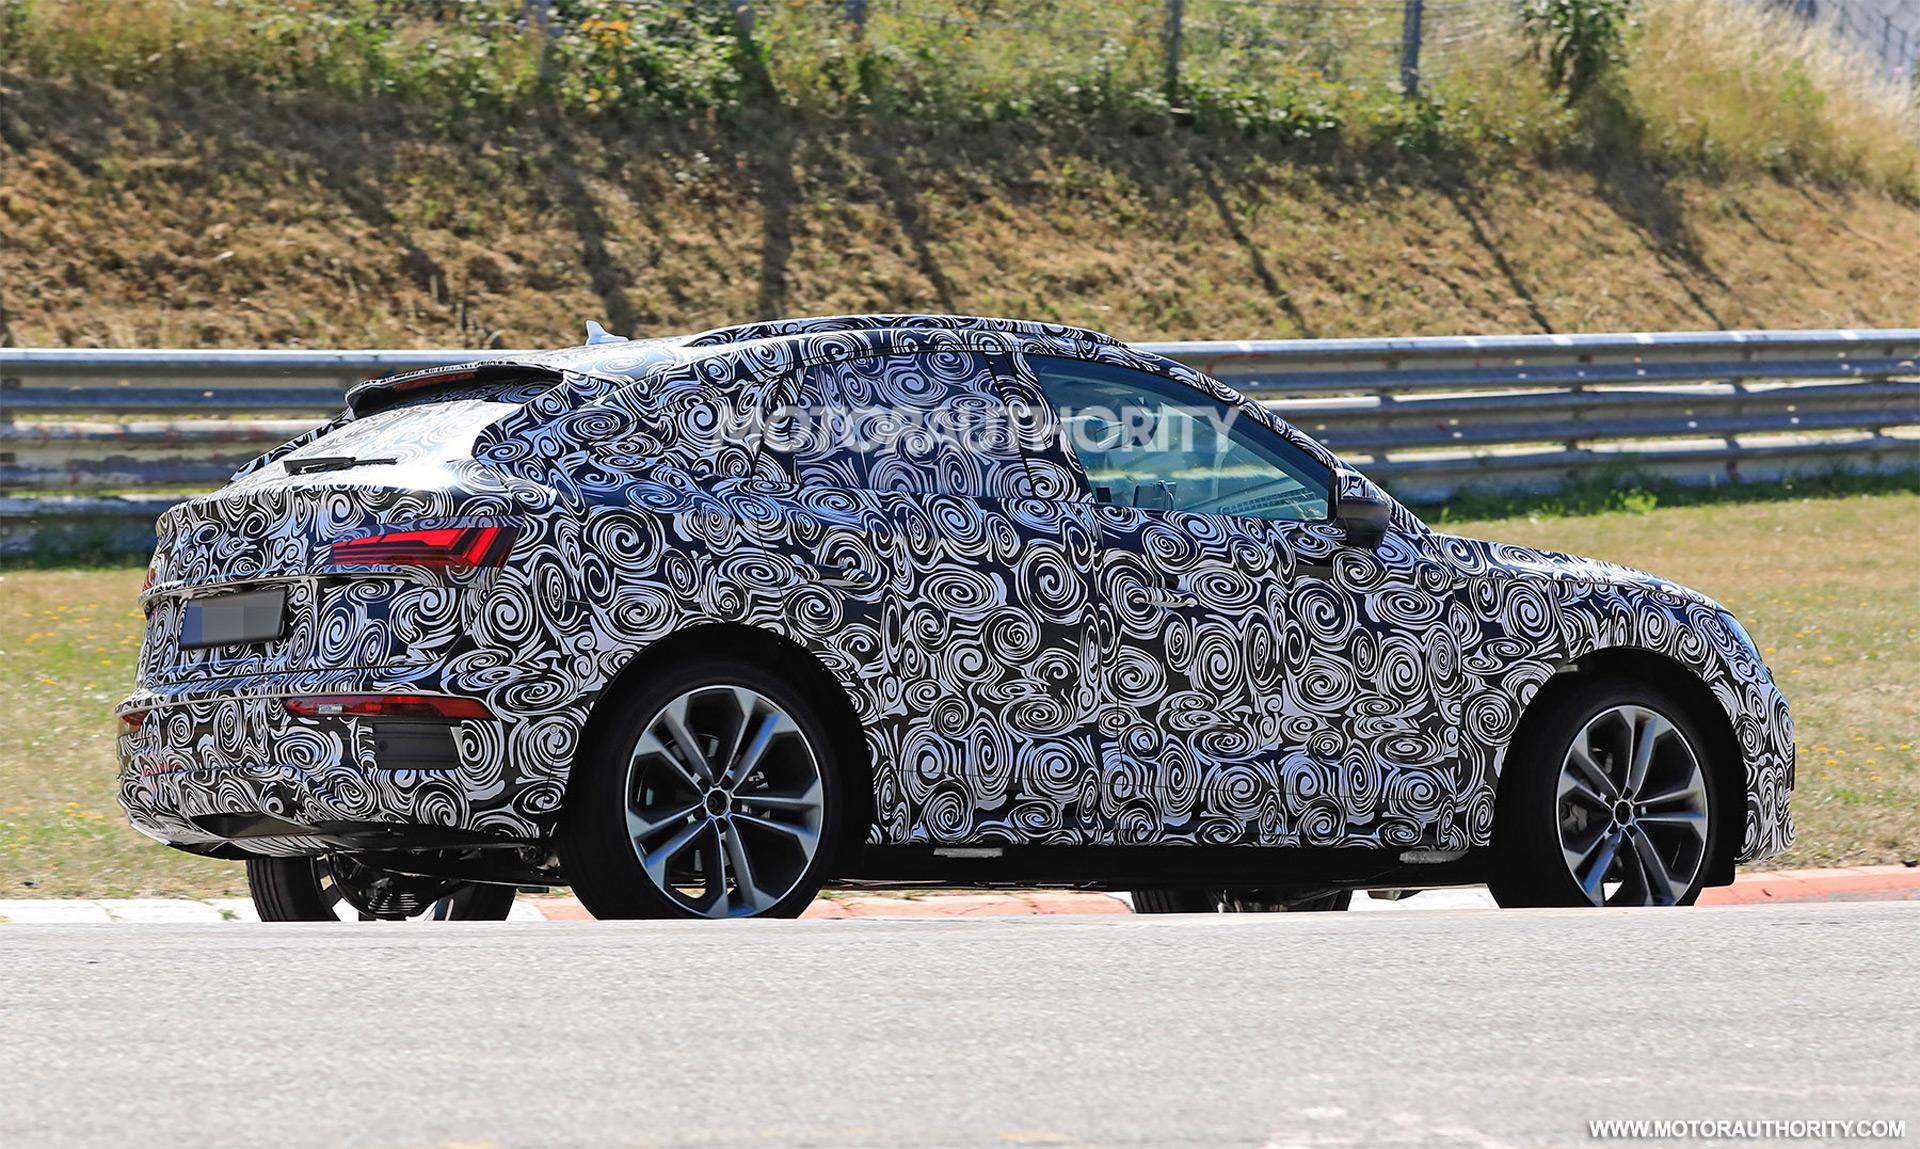 2020 - [Audi] Q5 Sportback - Page 7 2021-audi-q5-sportback-spy-shots--picture-credits-baldauf-sb-medien_100753282_h